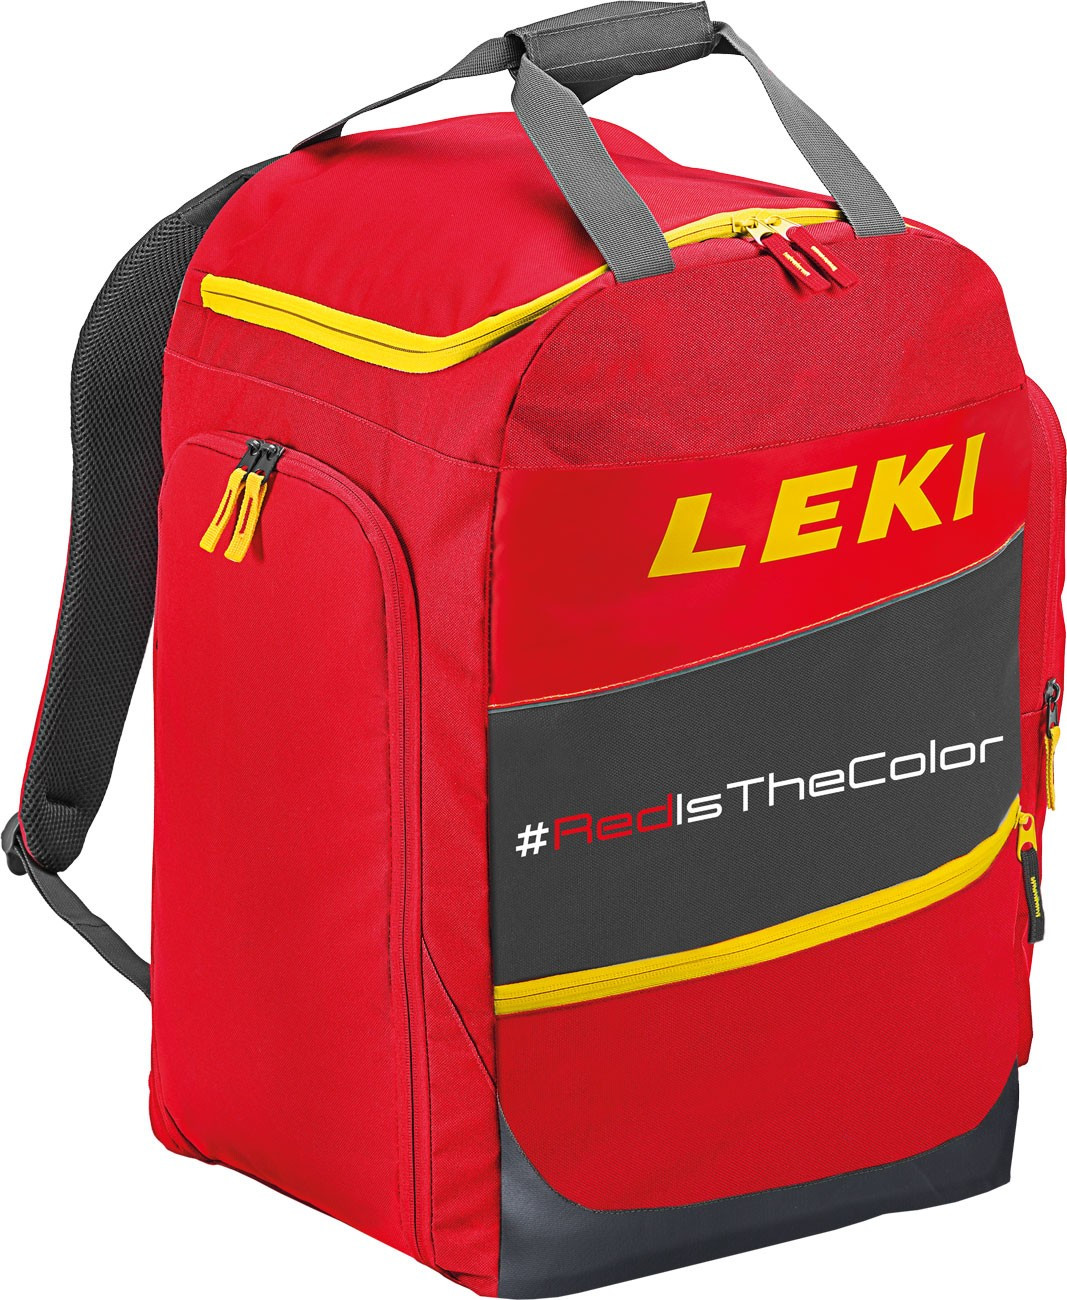 Leki Bootbag Red